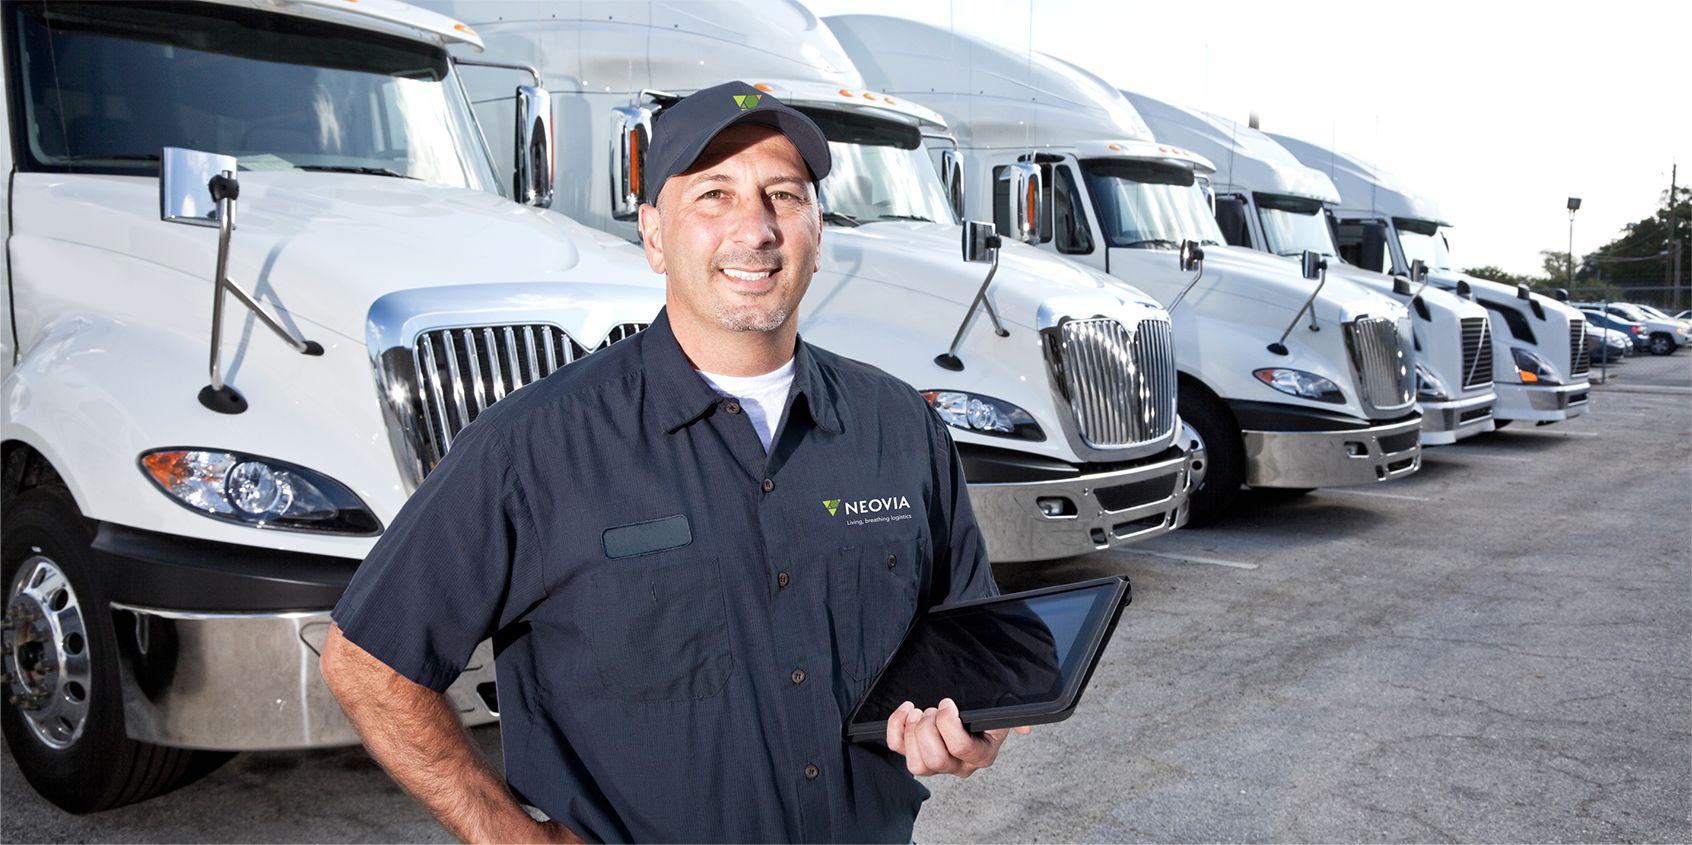 Neovia worker standing in front of row of semi trucks